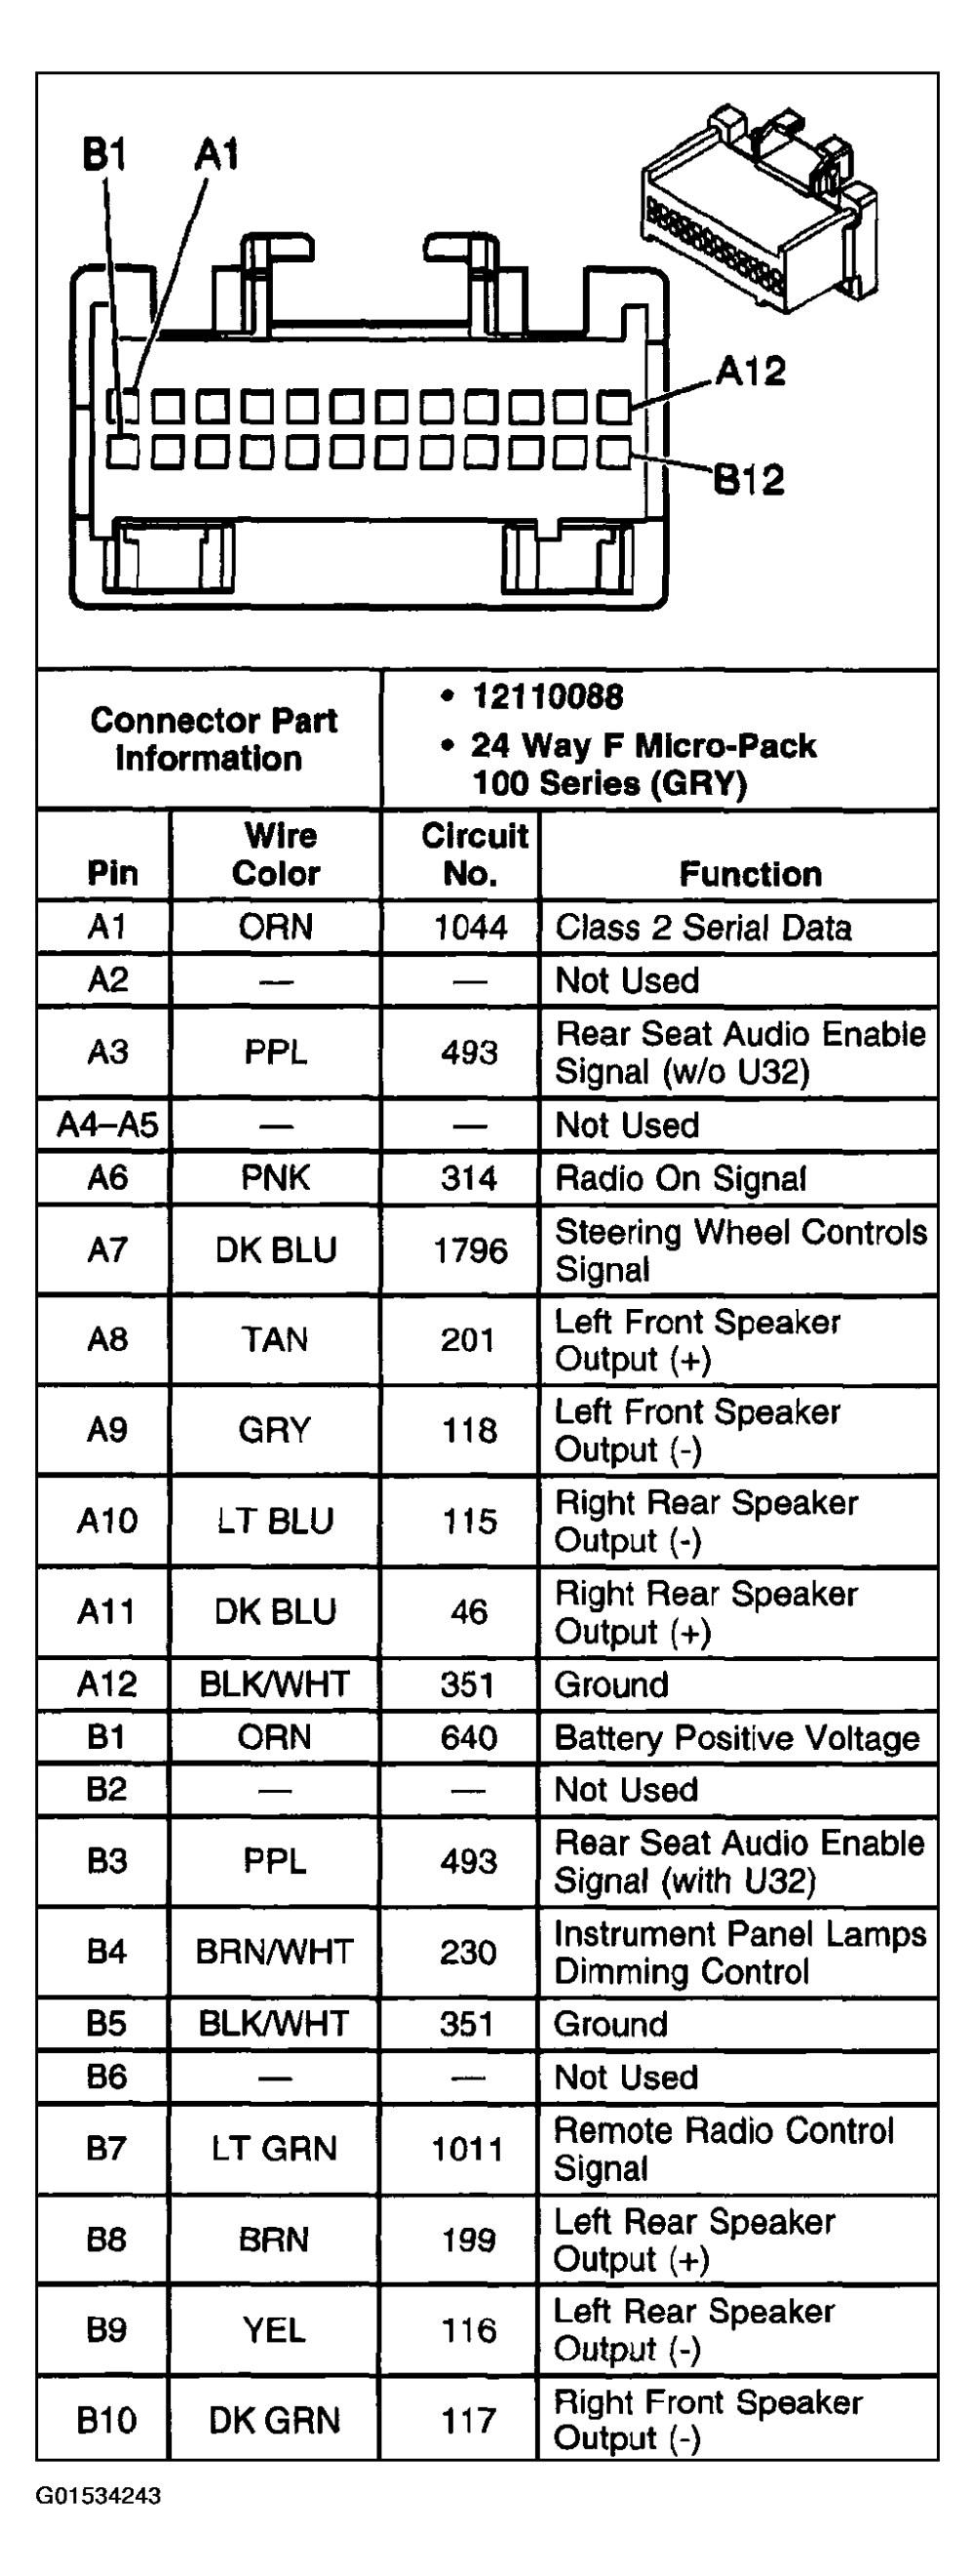 medium resolution of 2000 chevy malibu radio wiring diagram